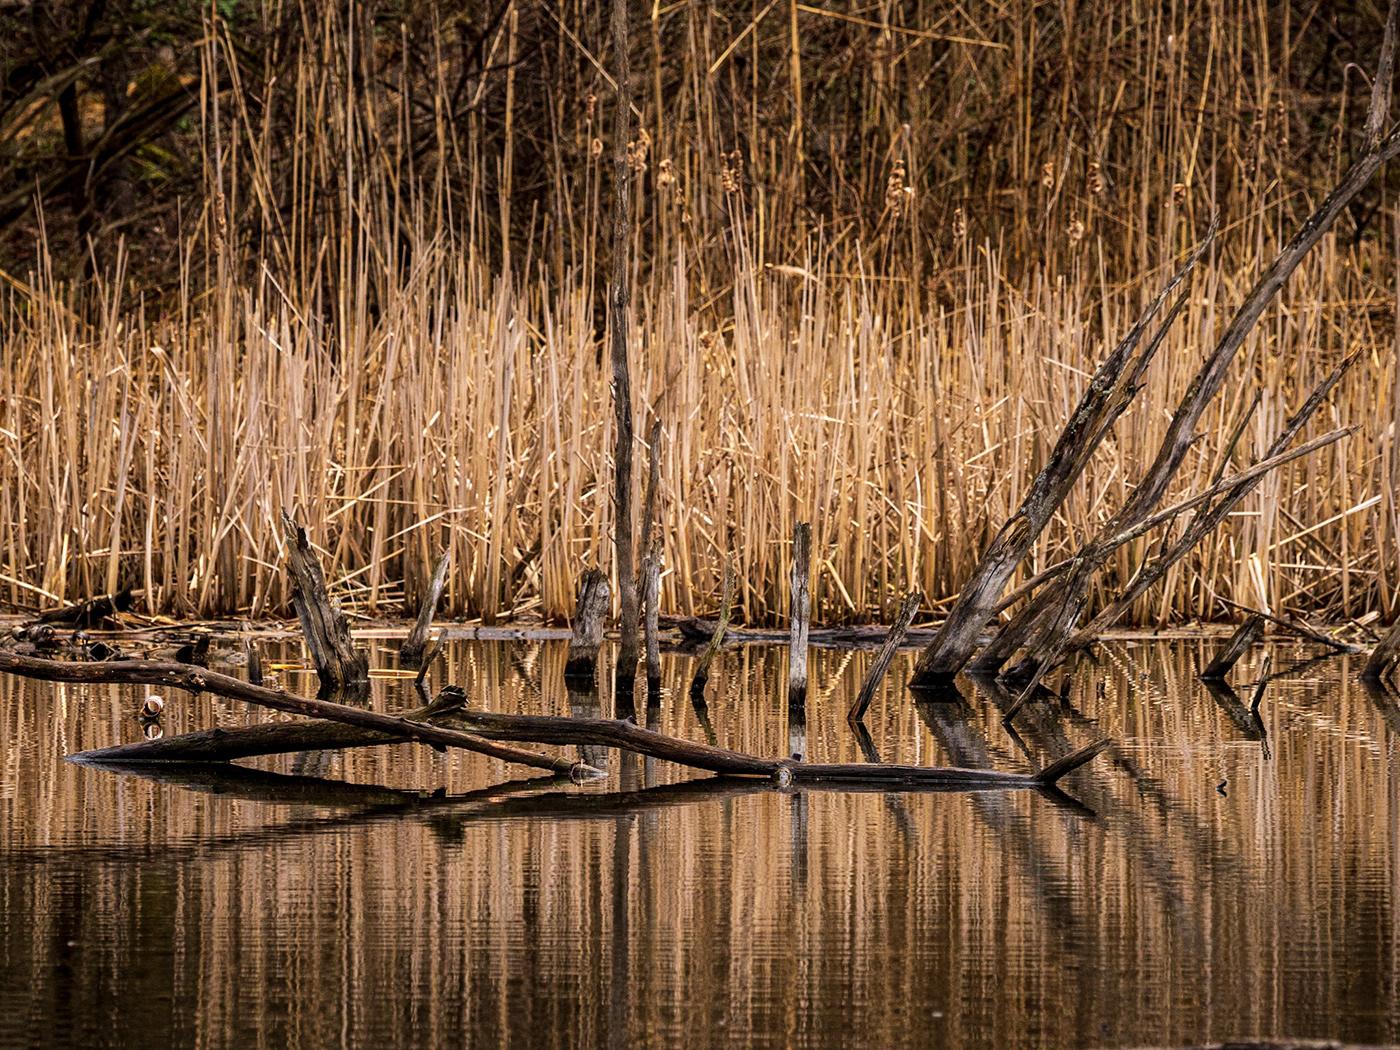 birds Nature olympus photo walk super zoom wildlife highland creek Ontario